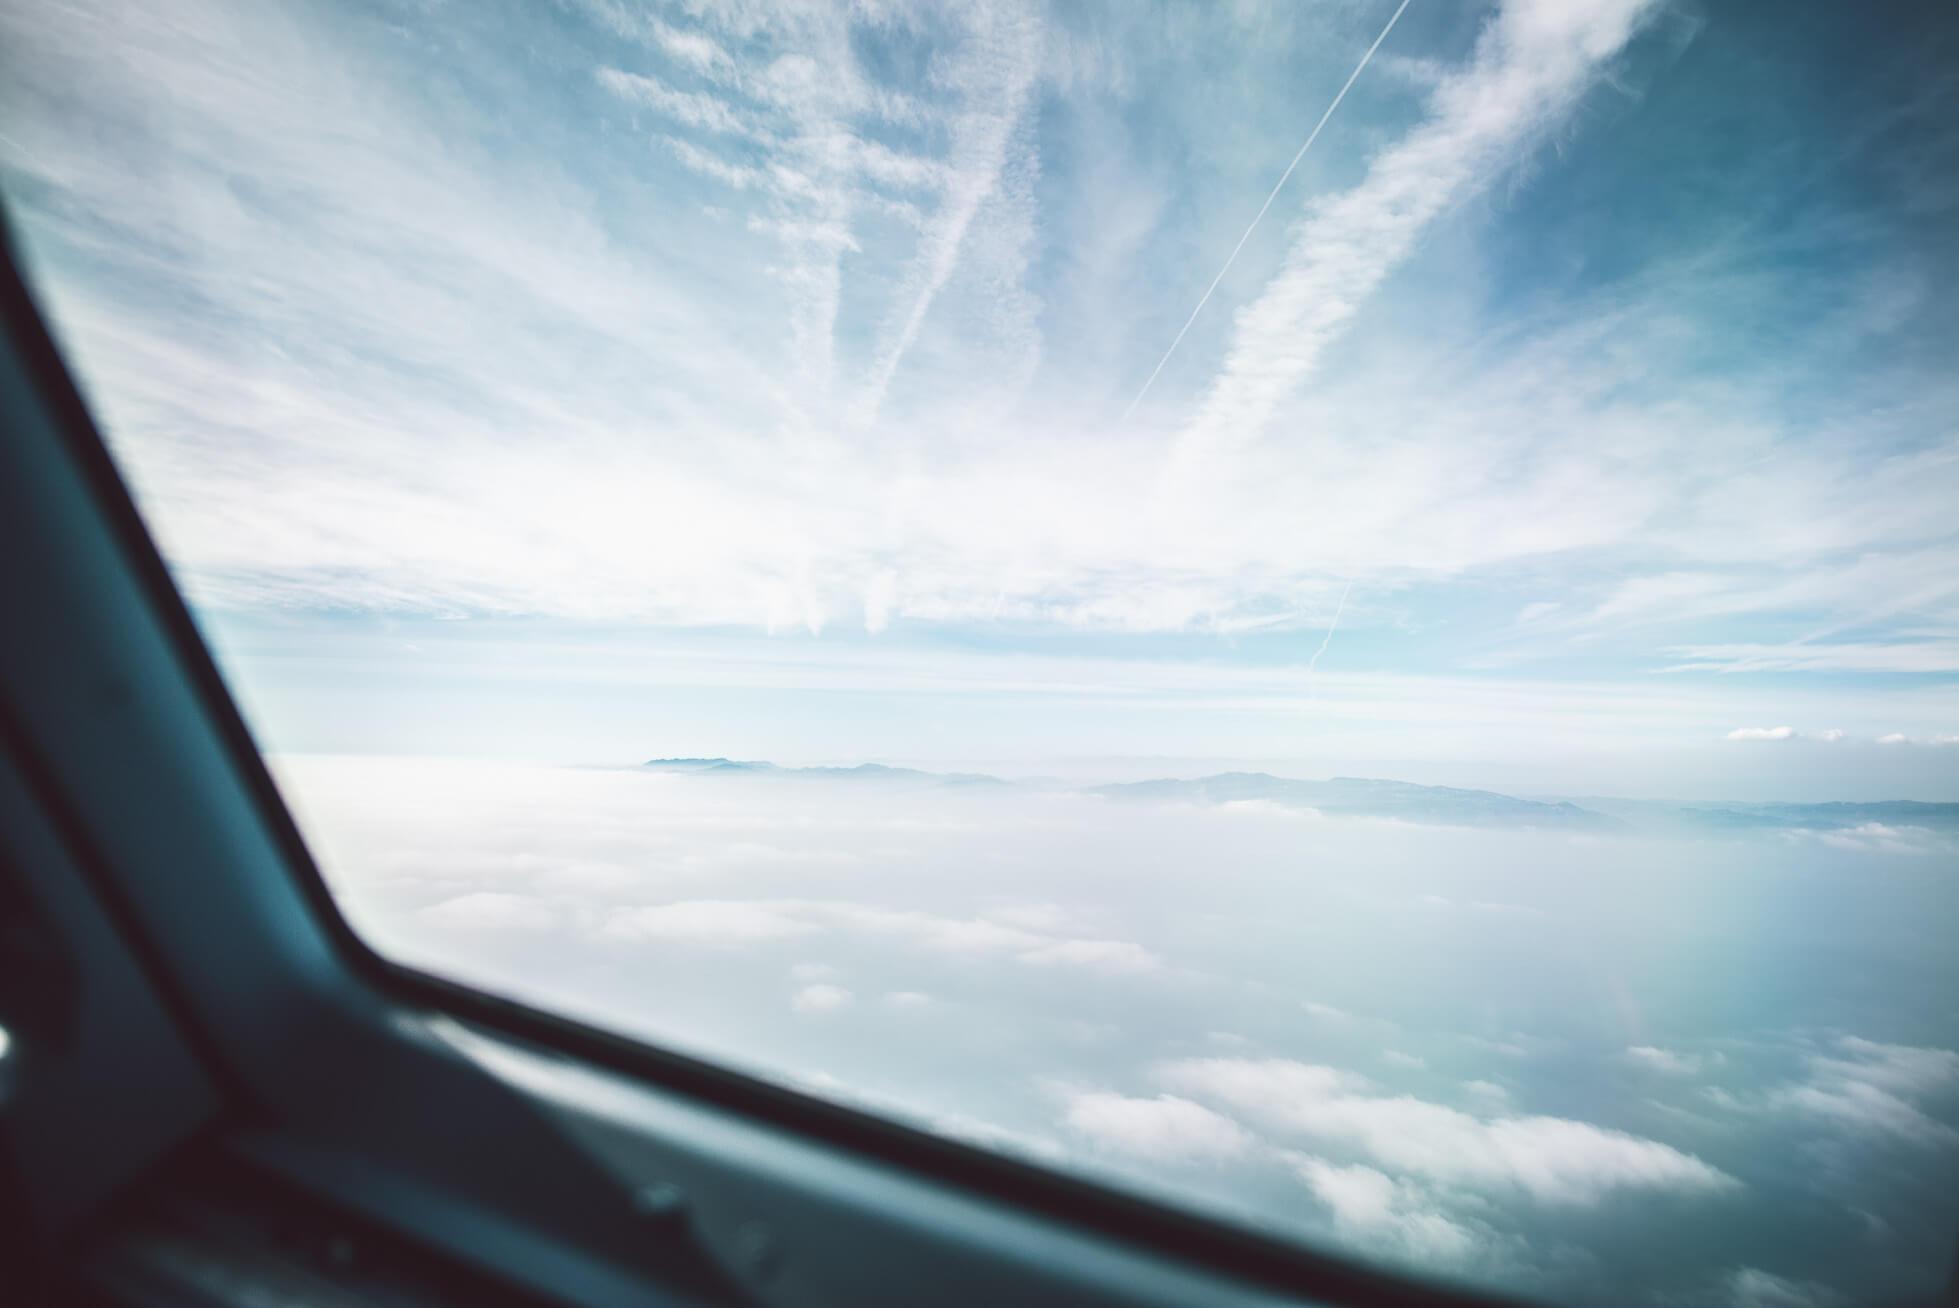 janni-deler-flight-mode-sasDSC_1547